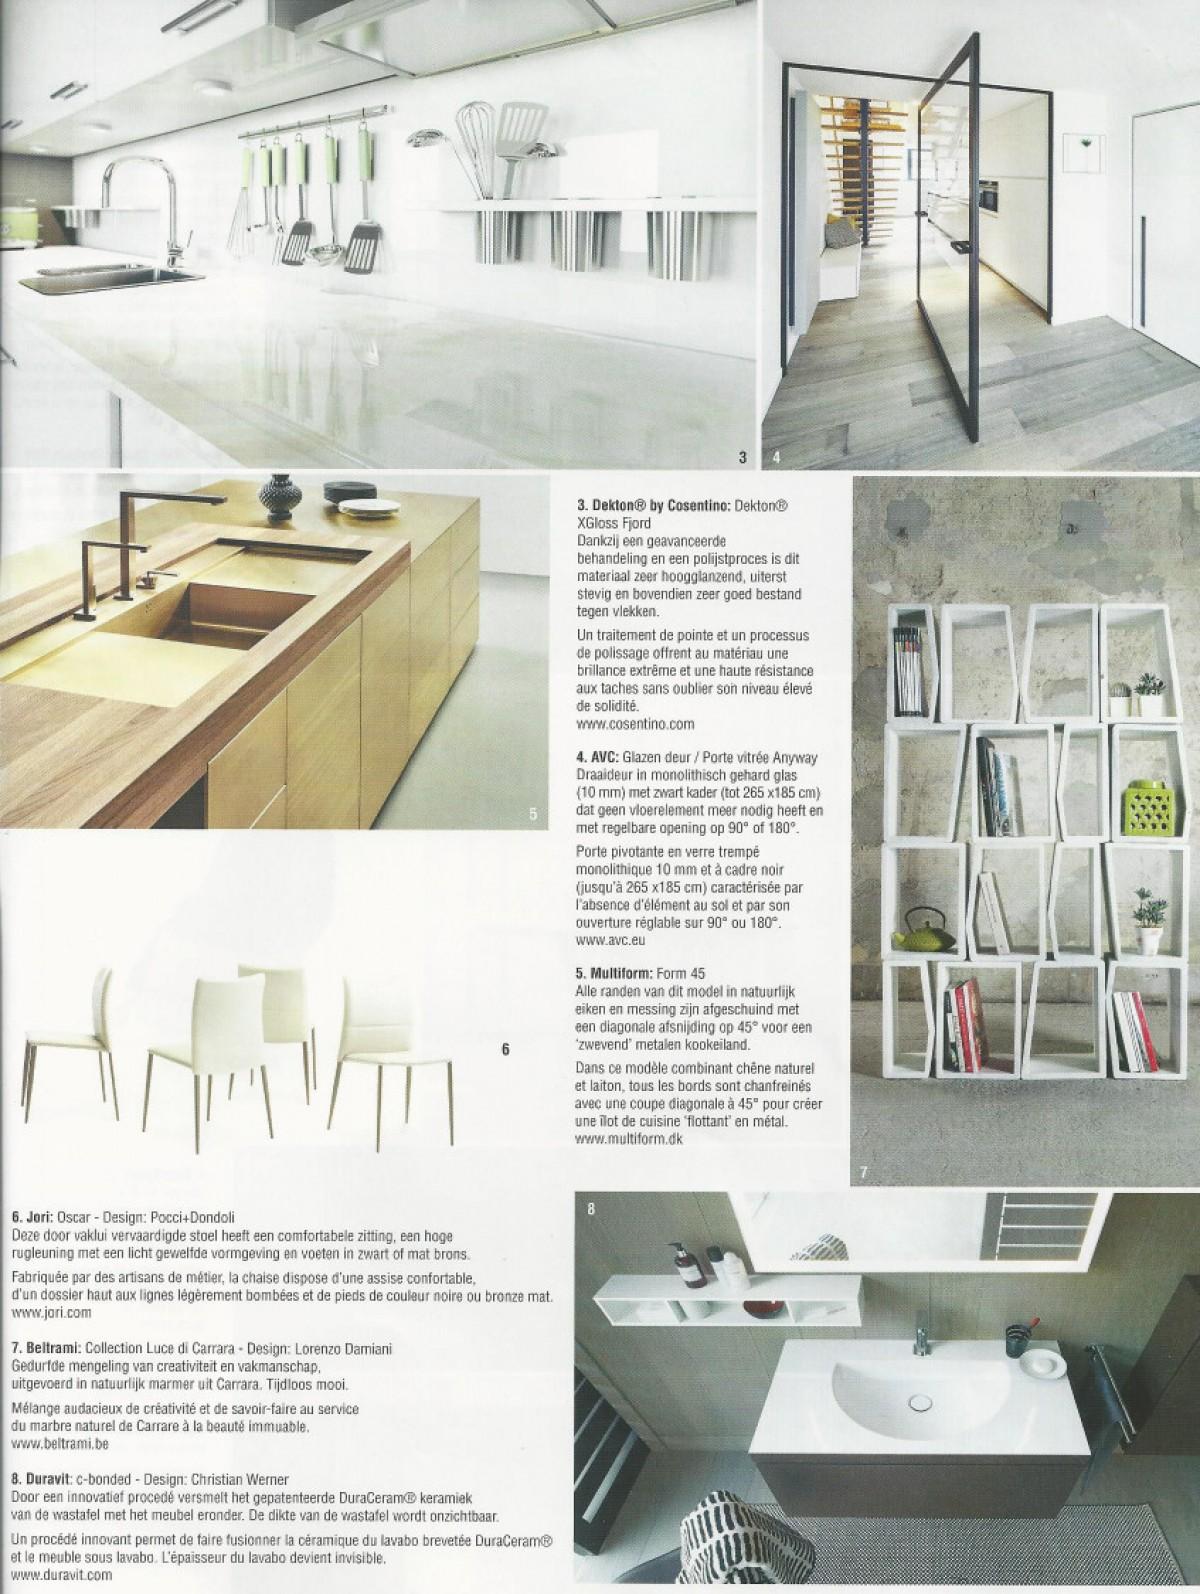 8 Zwarte Design Stoelen.Villas Publications Design Furniture Jori